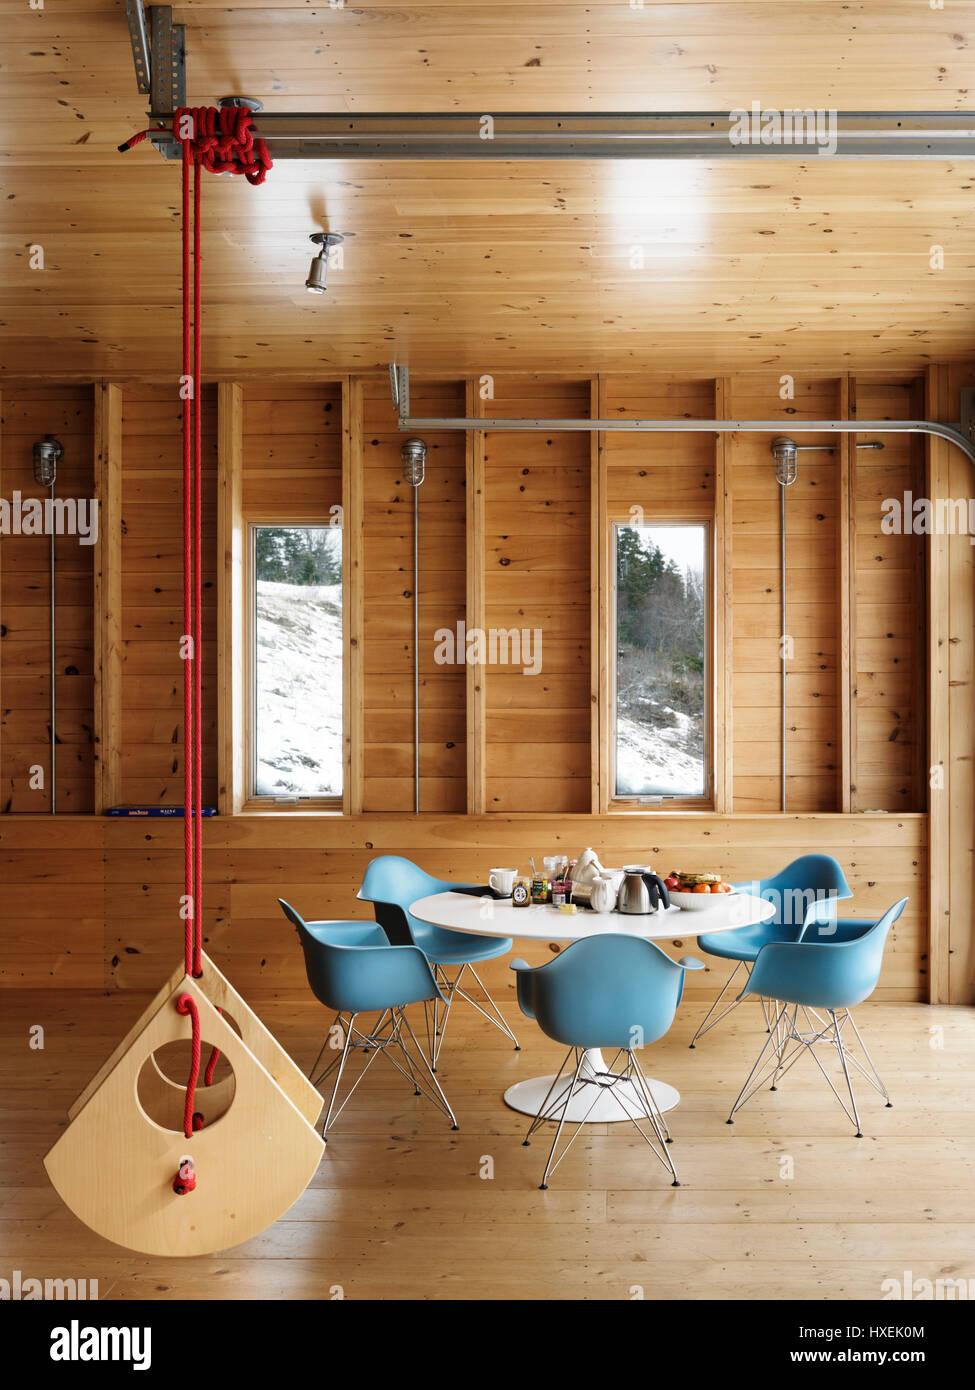 Eames House Stockfotos & Eames House Bilder - Alamy